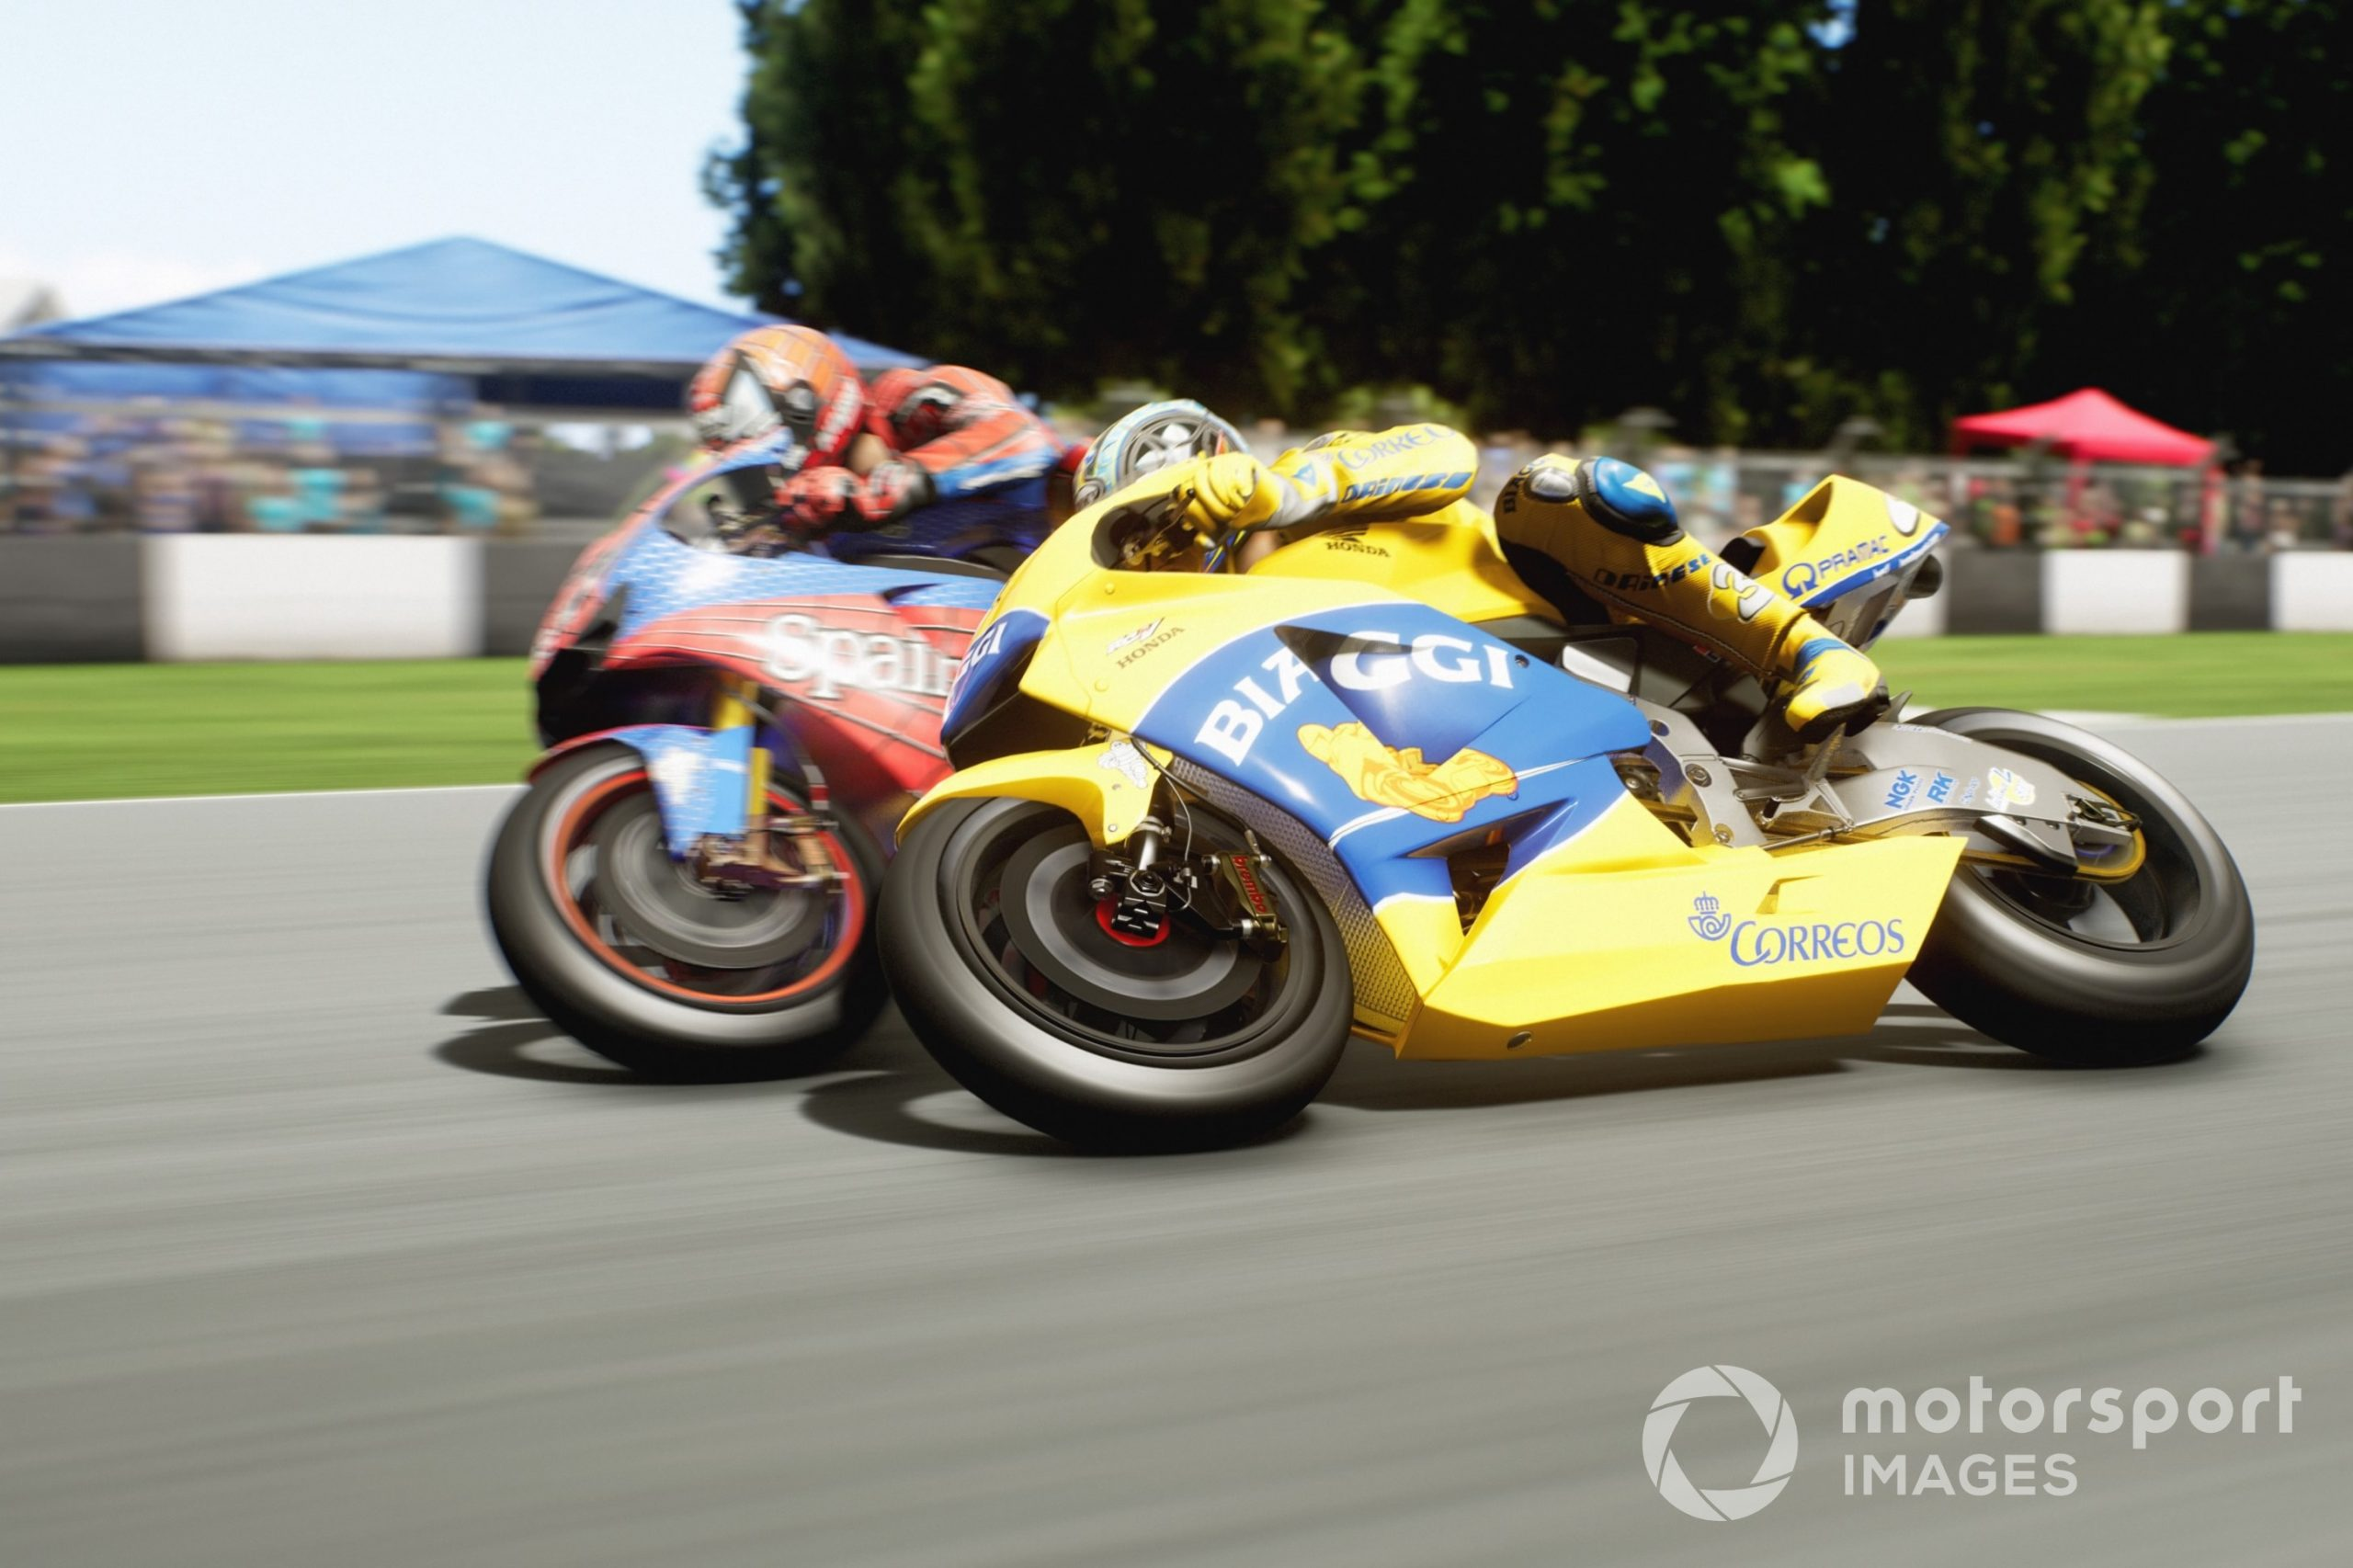 Classic Max Biaggi in MotoGP21